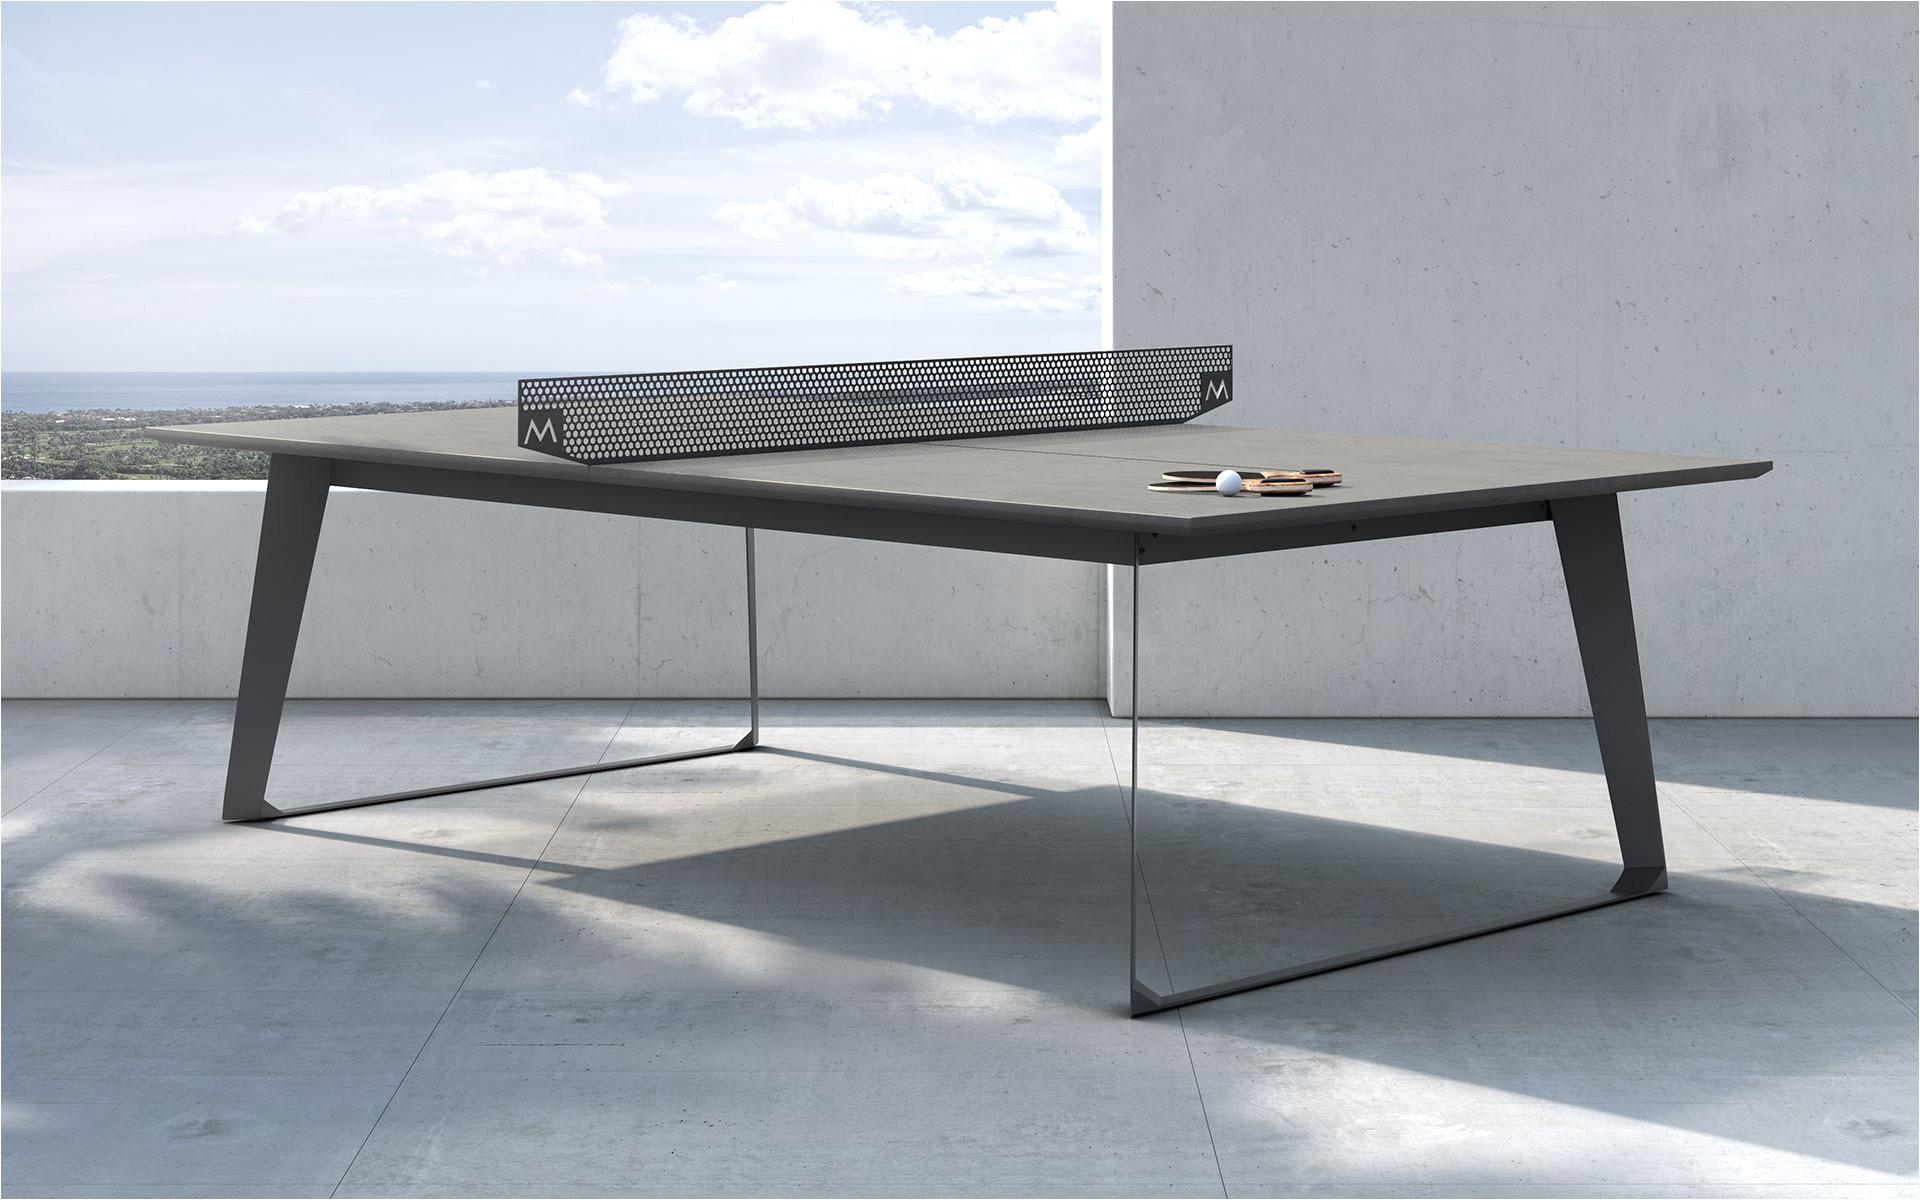 patio furniture stores in des moines ia modloft amsterdam outdoor ping pong table de ght pptblc